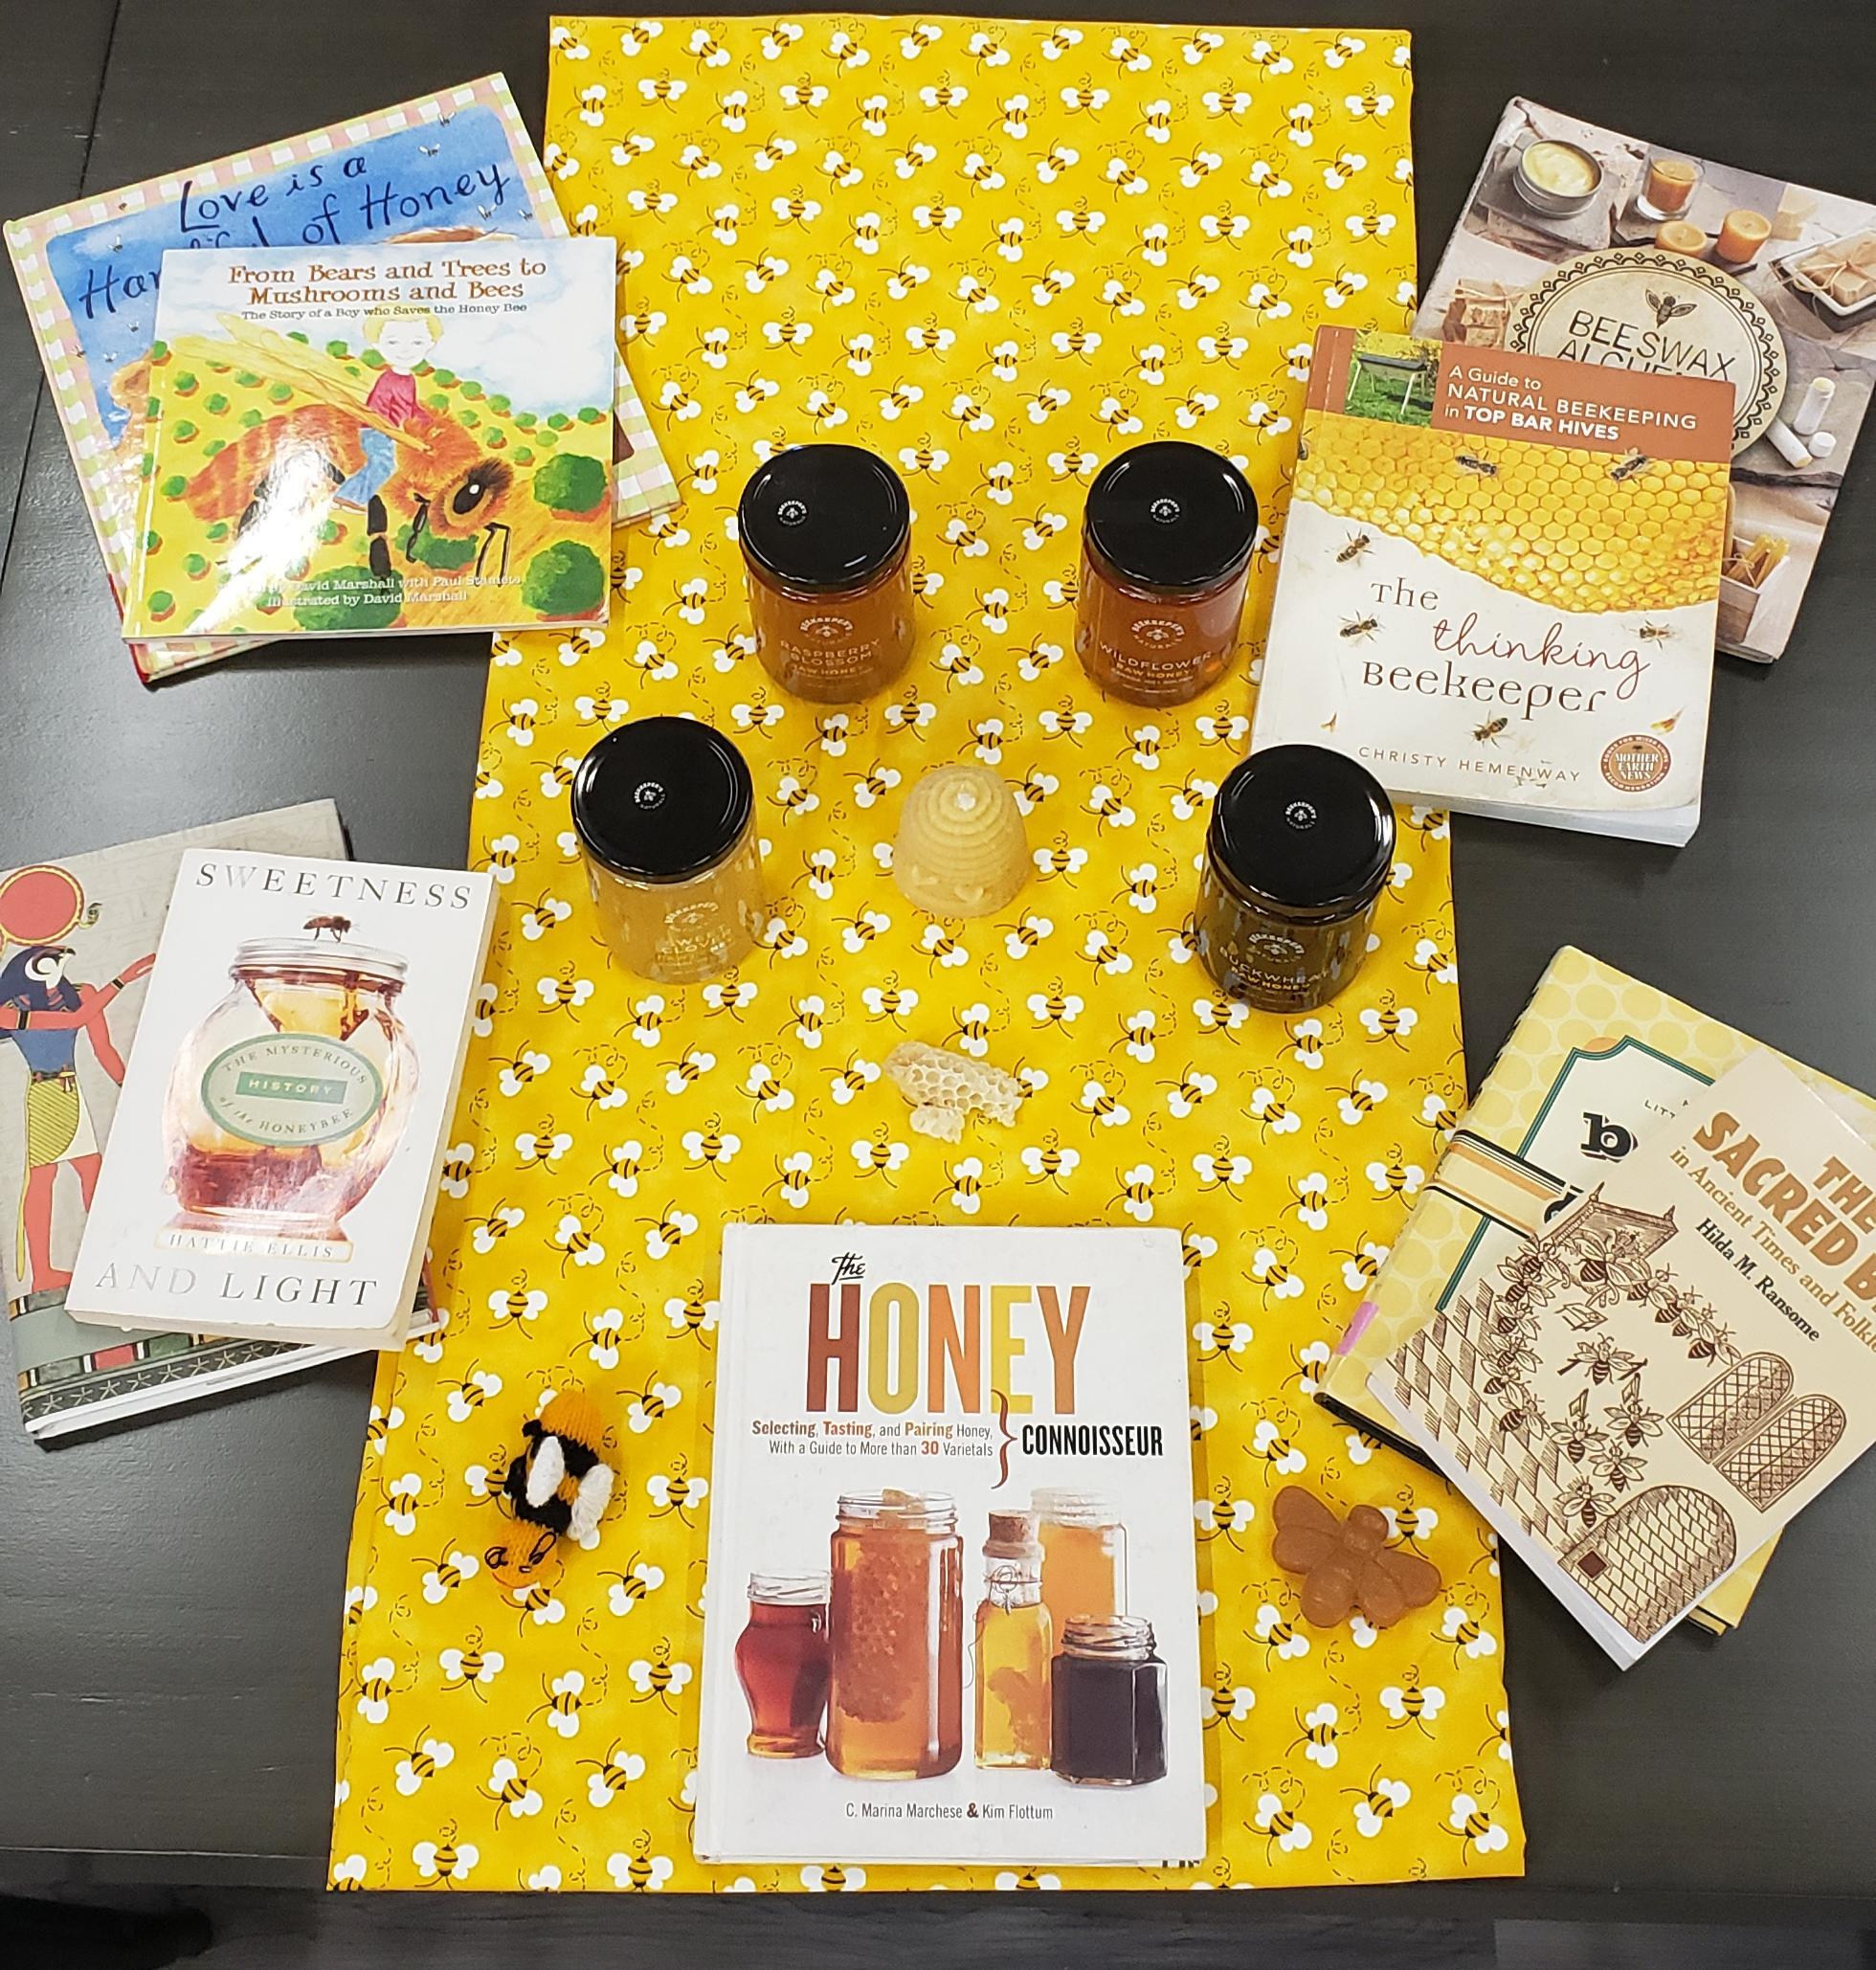 My honey tasting display, with some of my favorite honeybee books